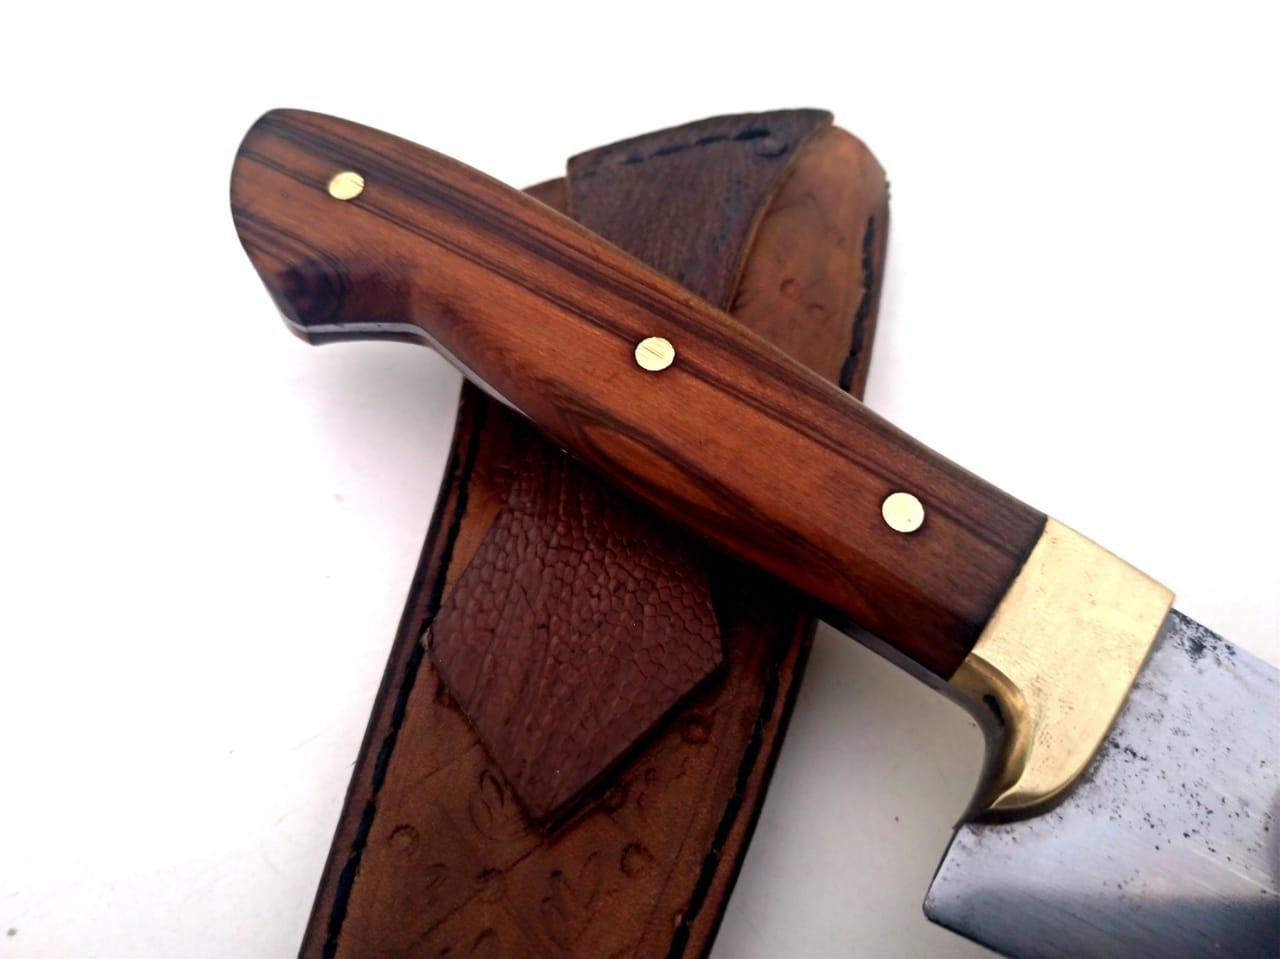 Faca artesanal tesoura de tosquia antiga